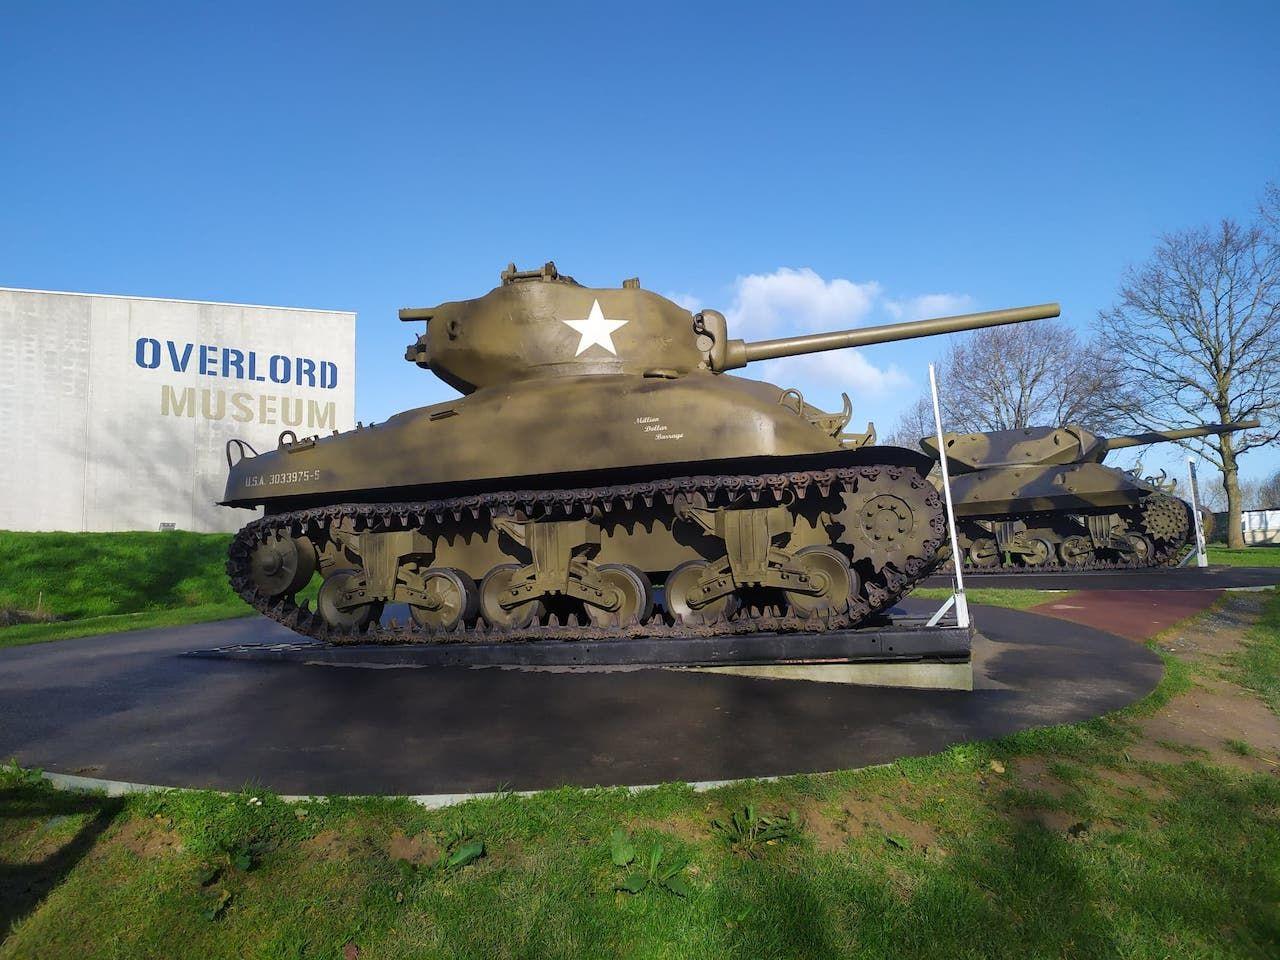 Overlord Museum Omaha Beach